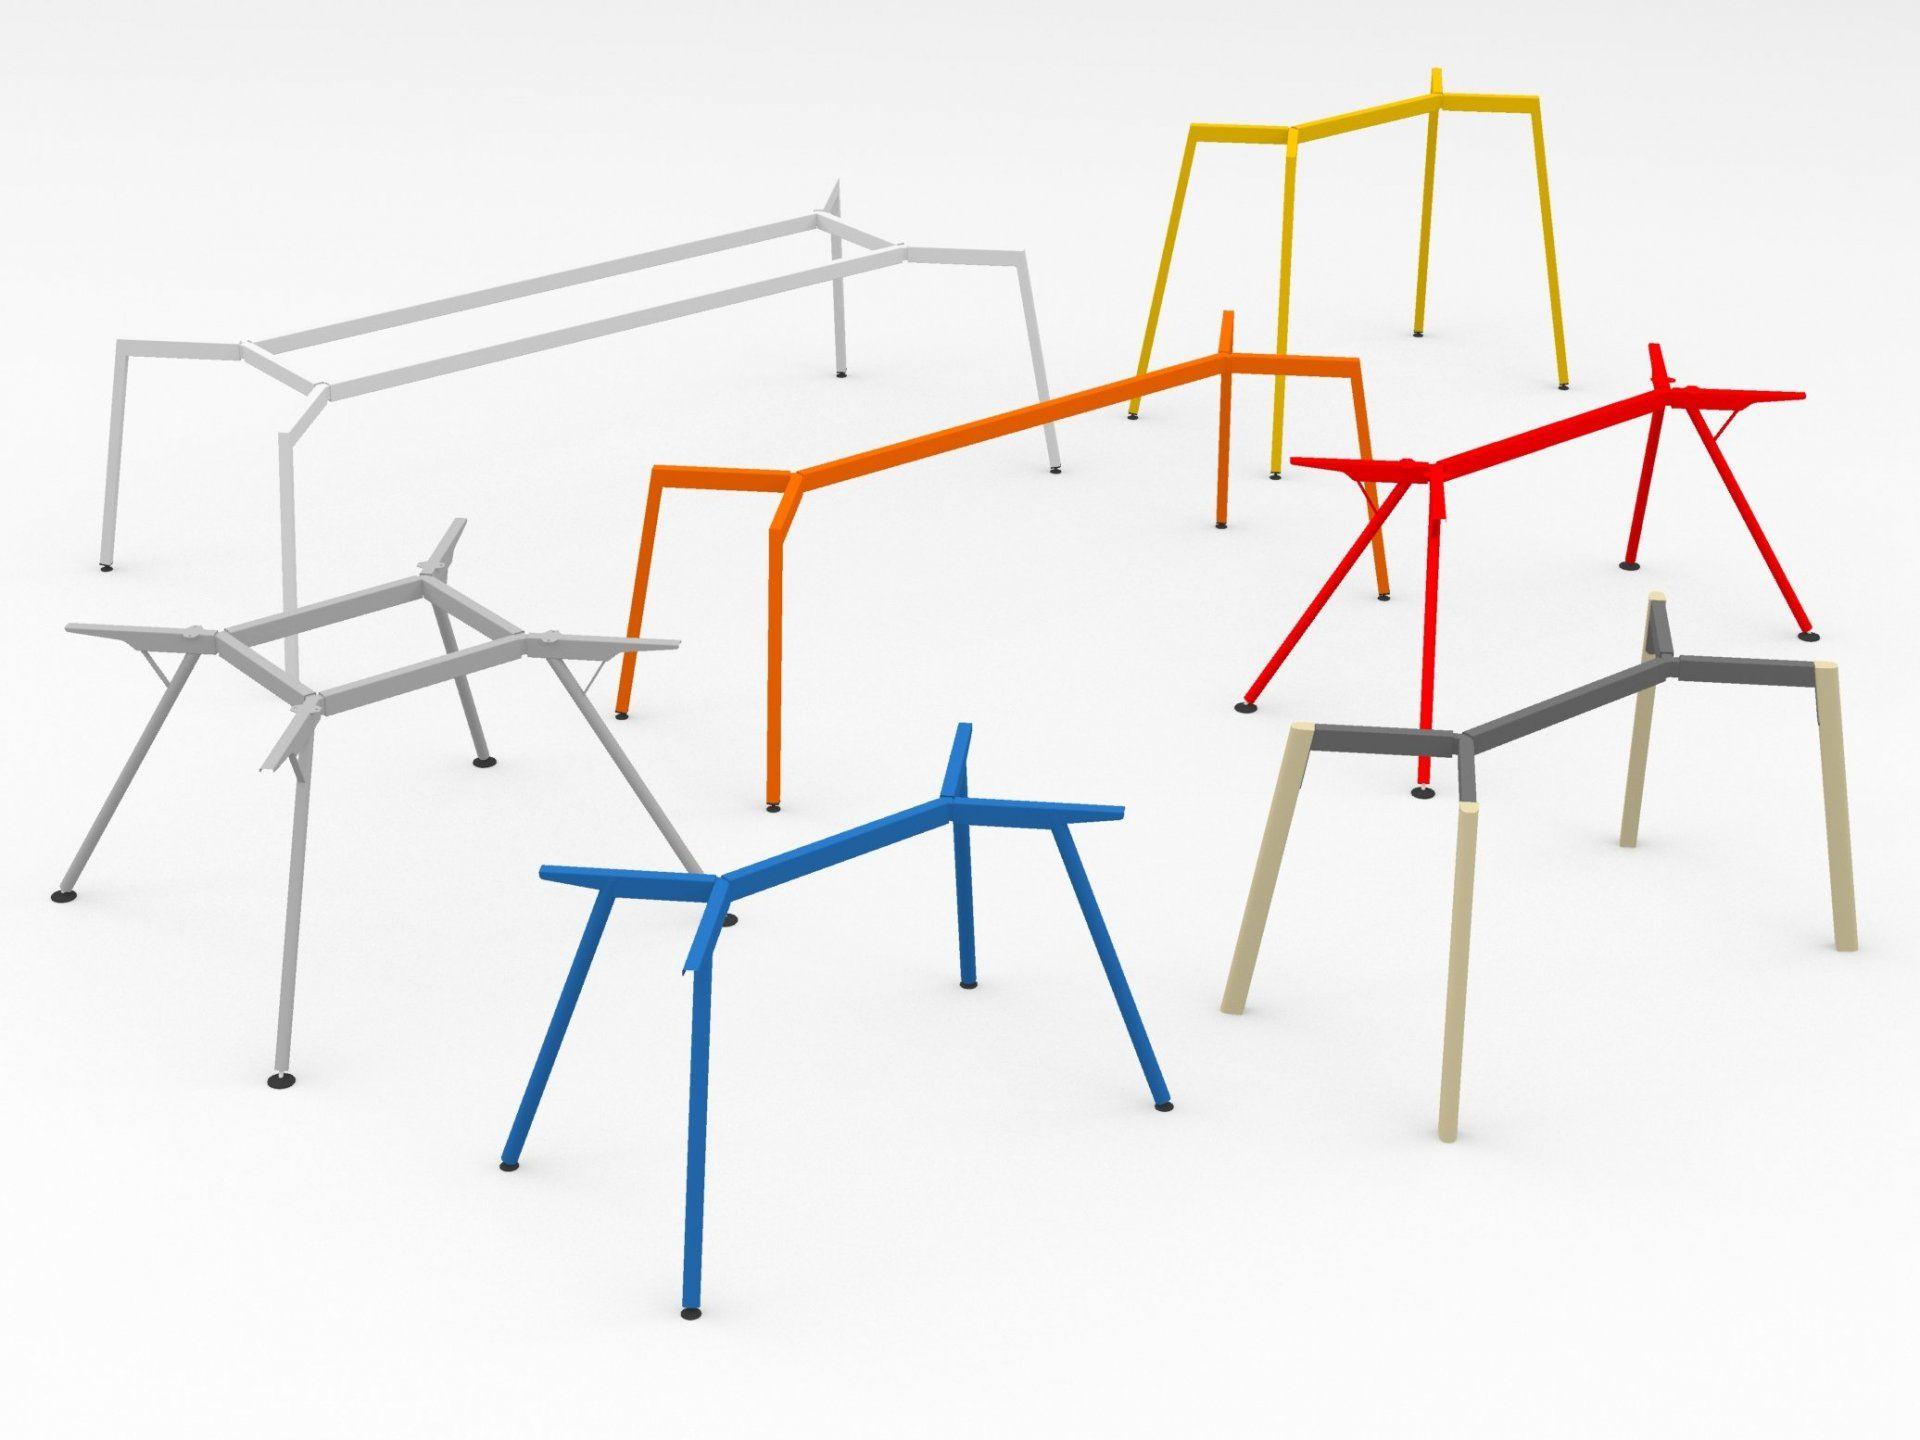 Modulor Tisch System Y2 farbig Work life Balance